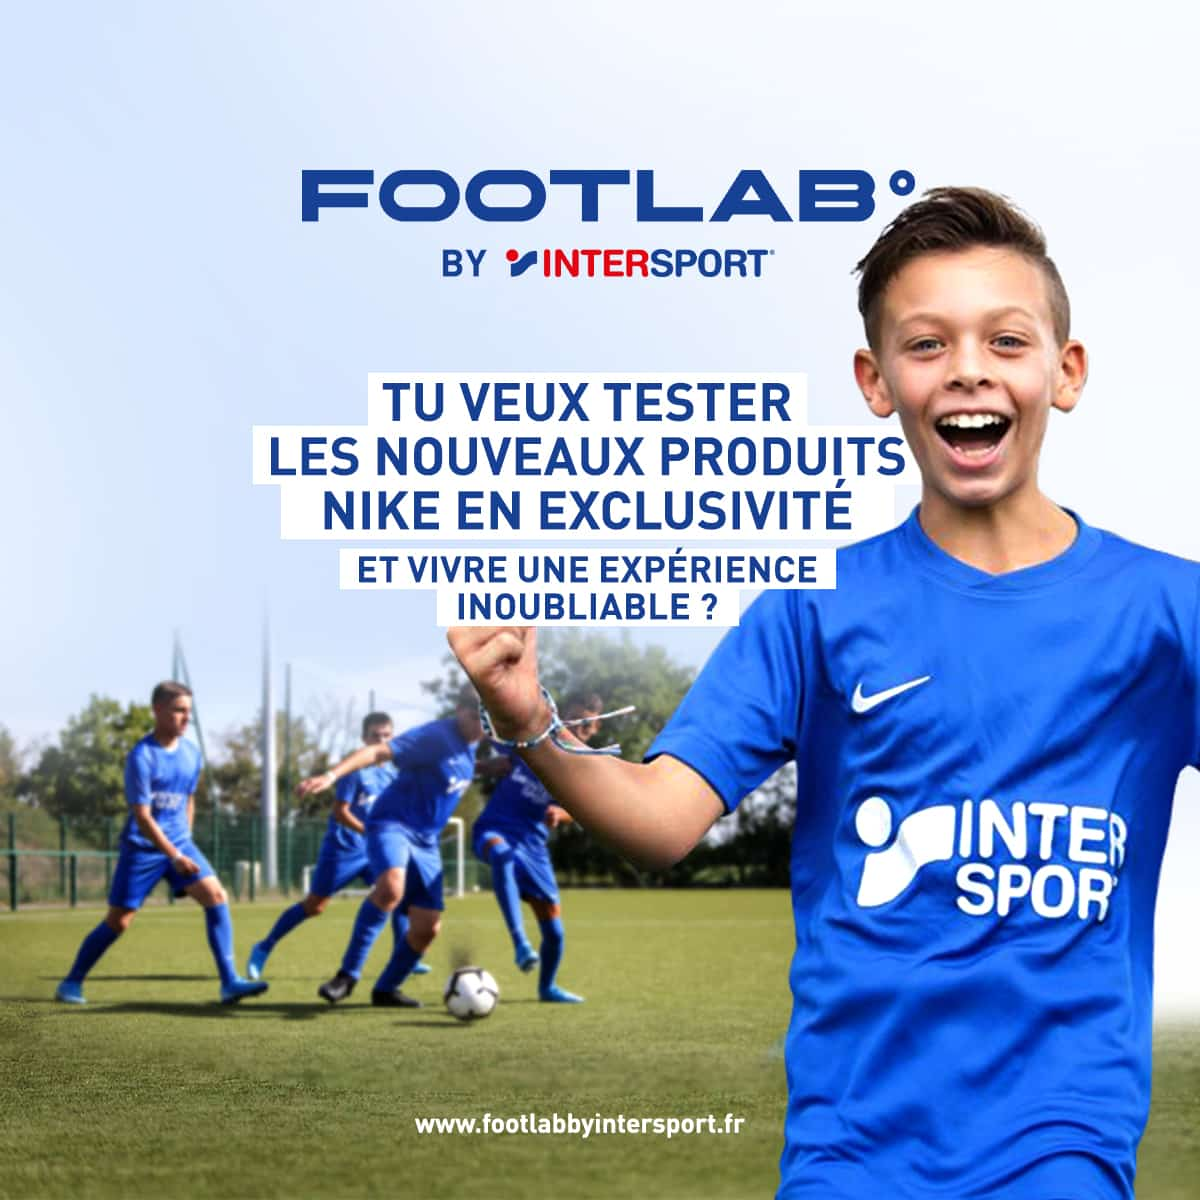 footlab-by-intersport-2020-3